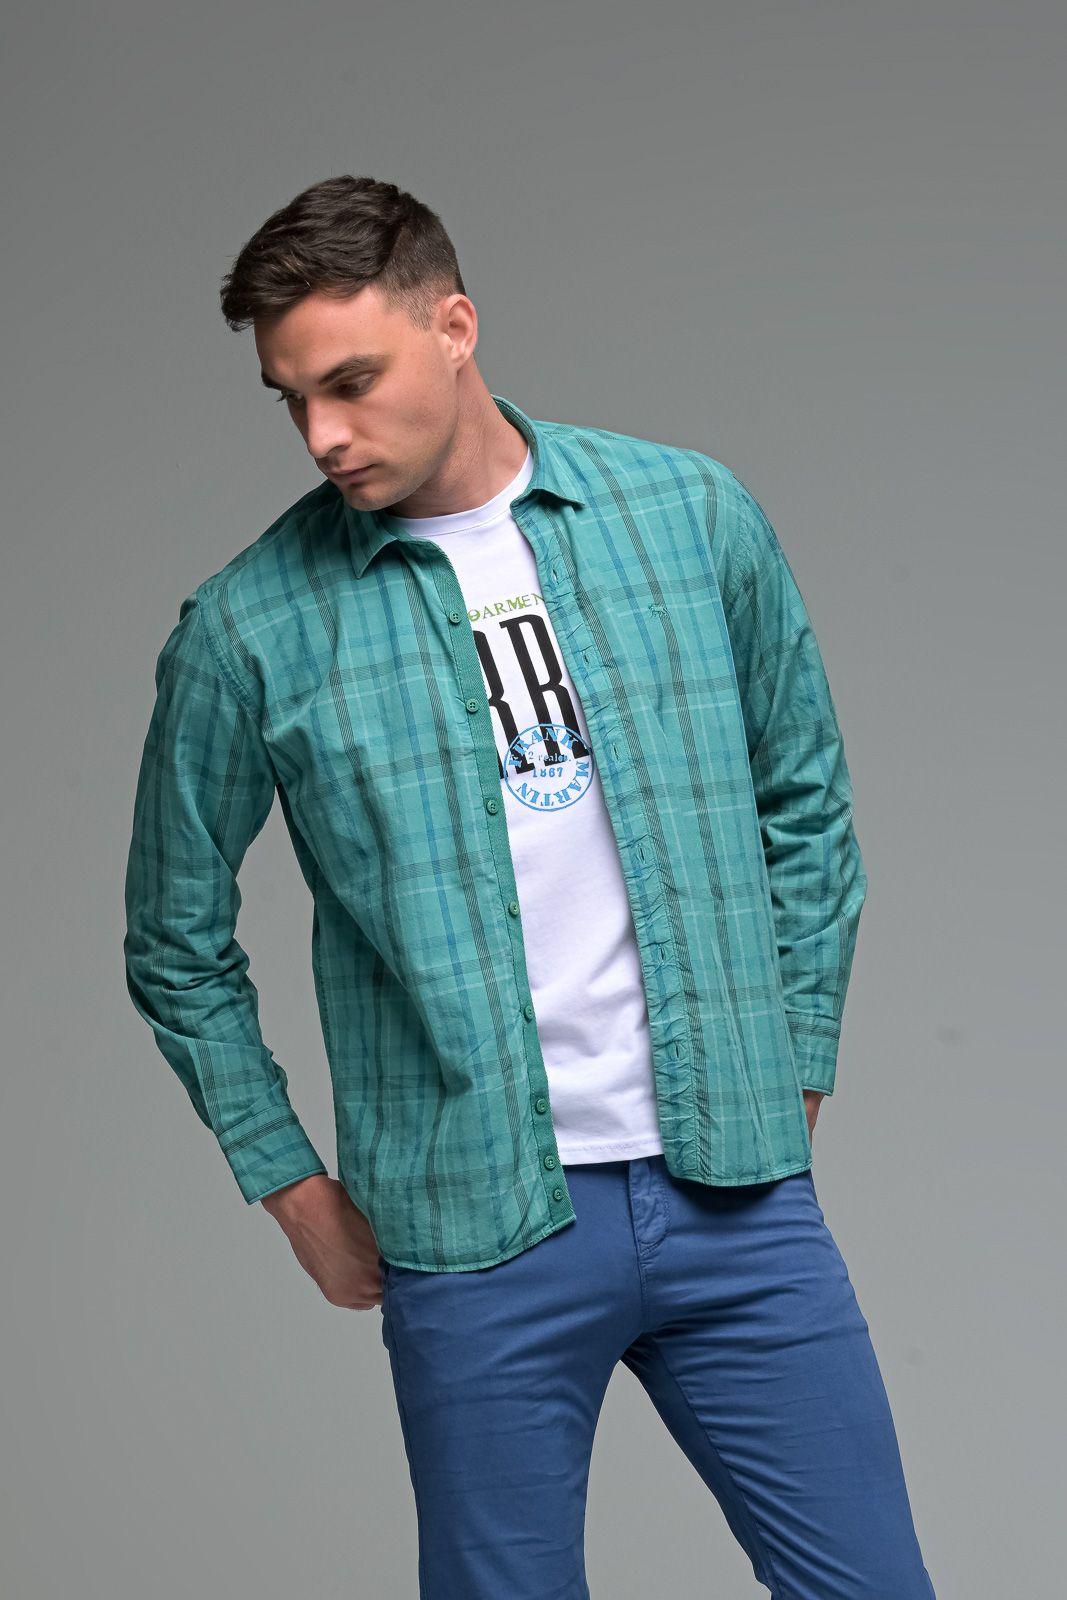 Casual Πράσινο Καρό Ανδρικό Πουκάμισο - Slim Fit